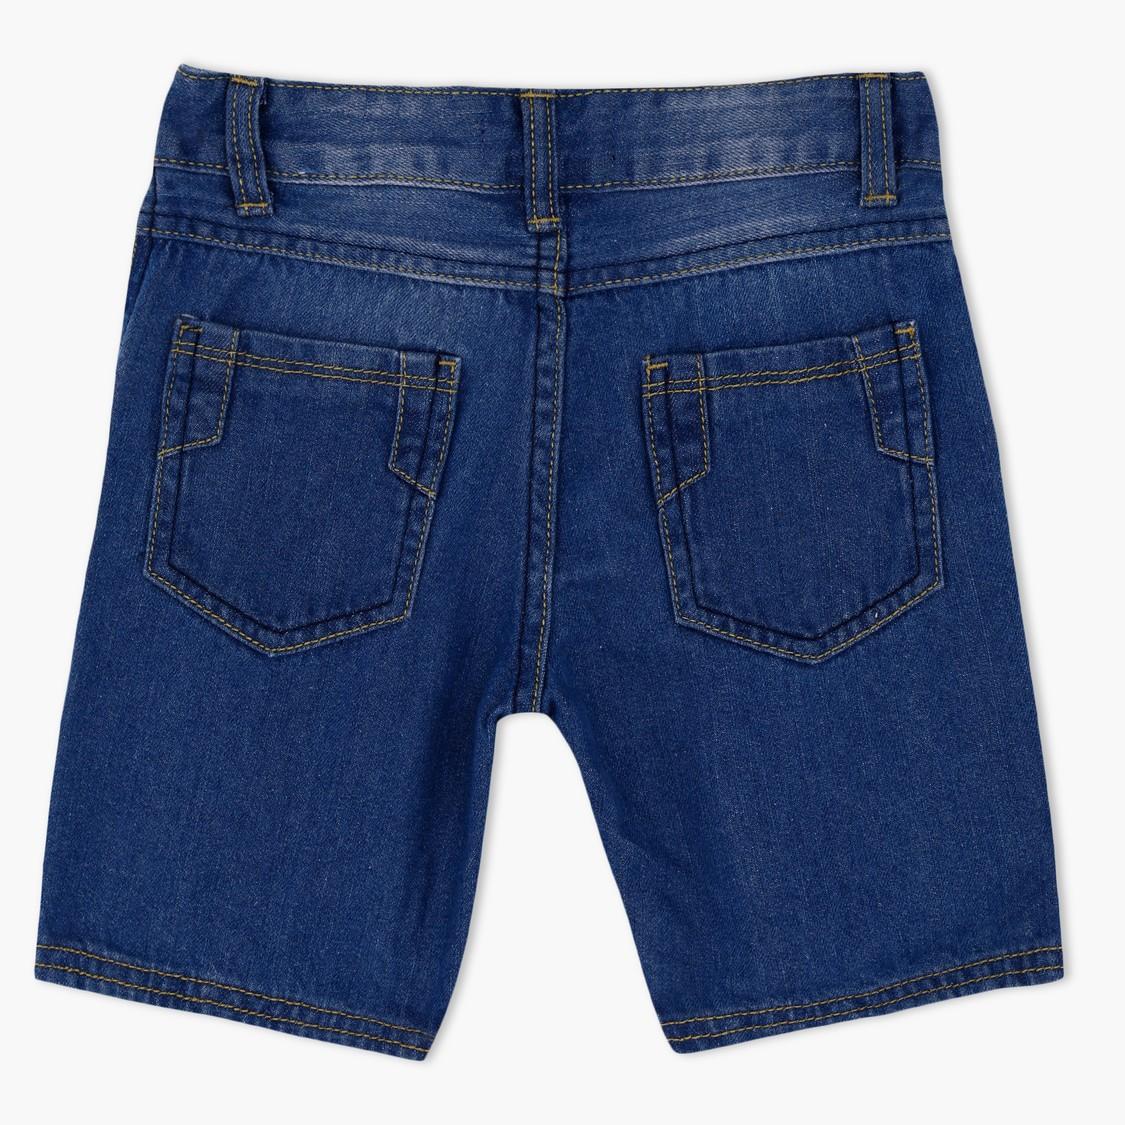 Denim Shorts with Contrasting Pocket